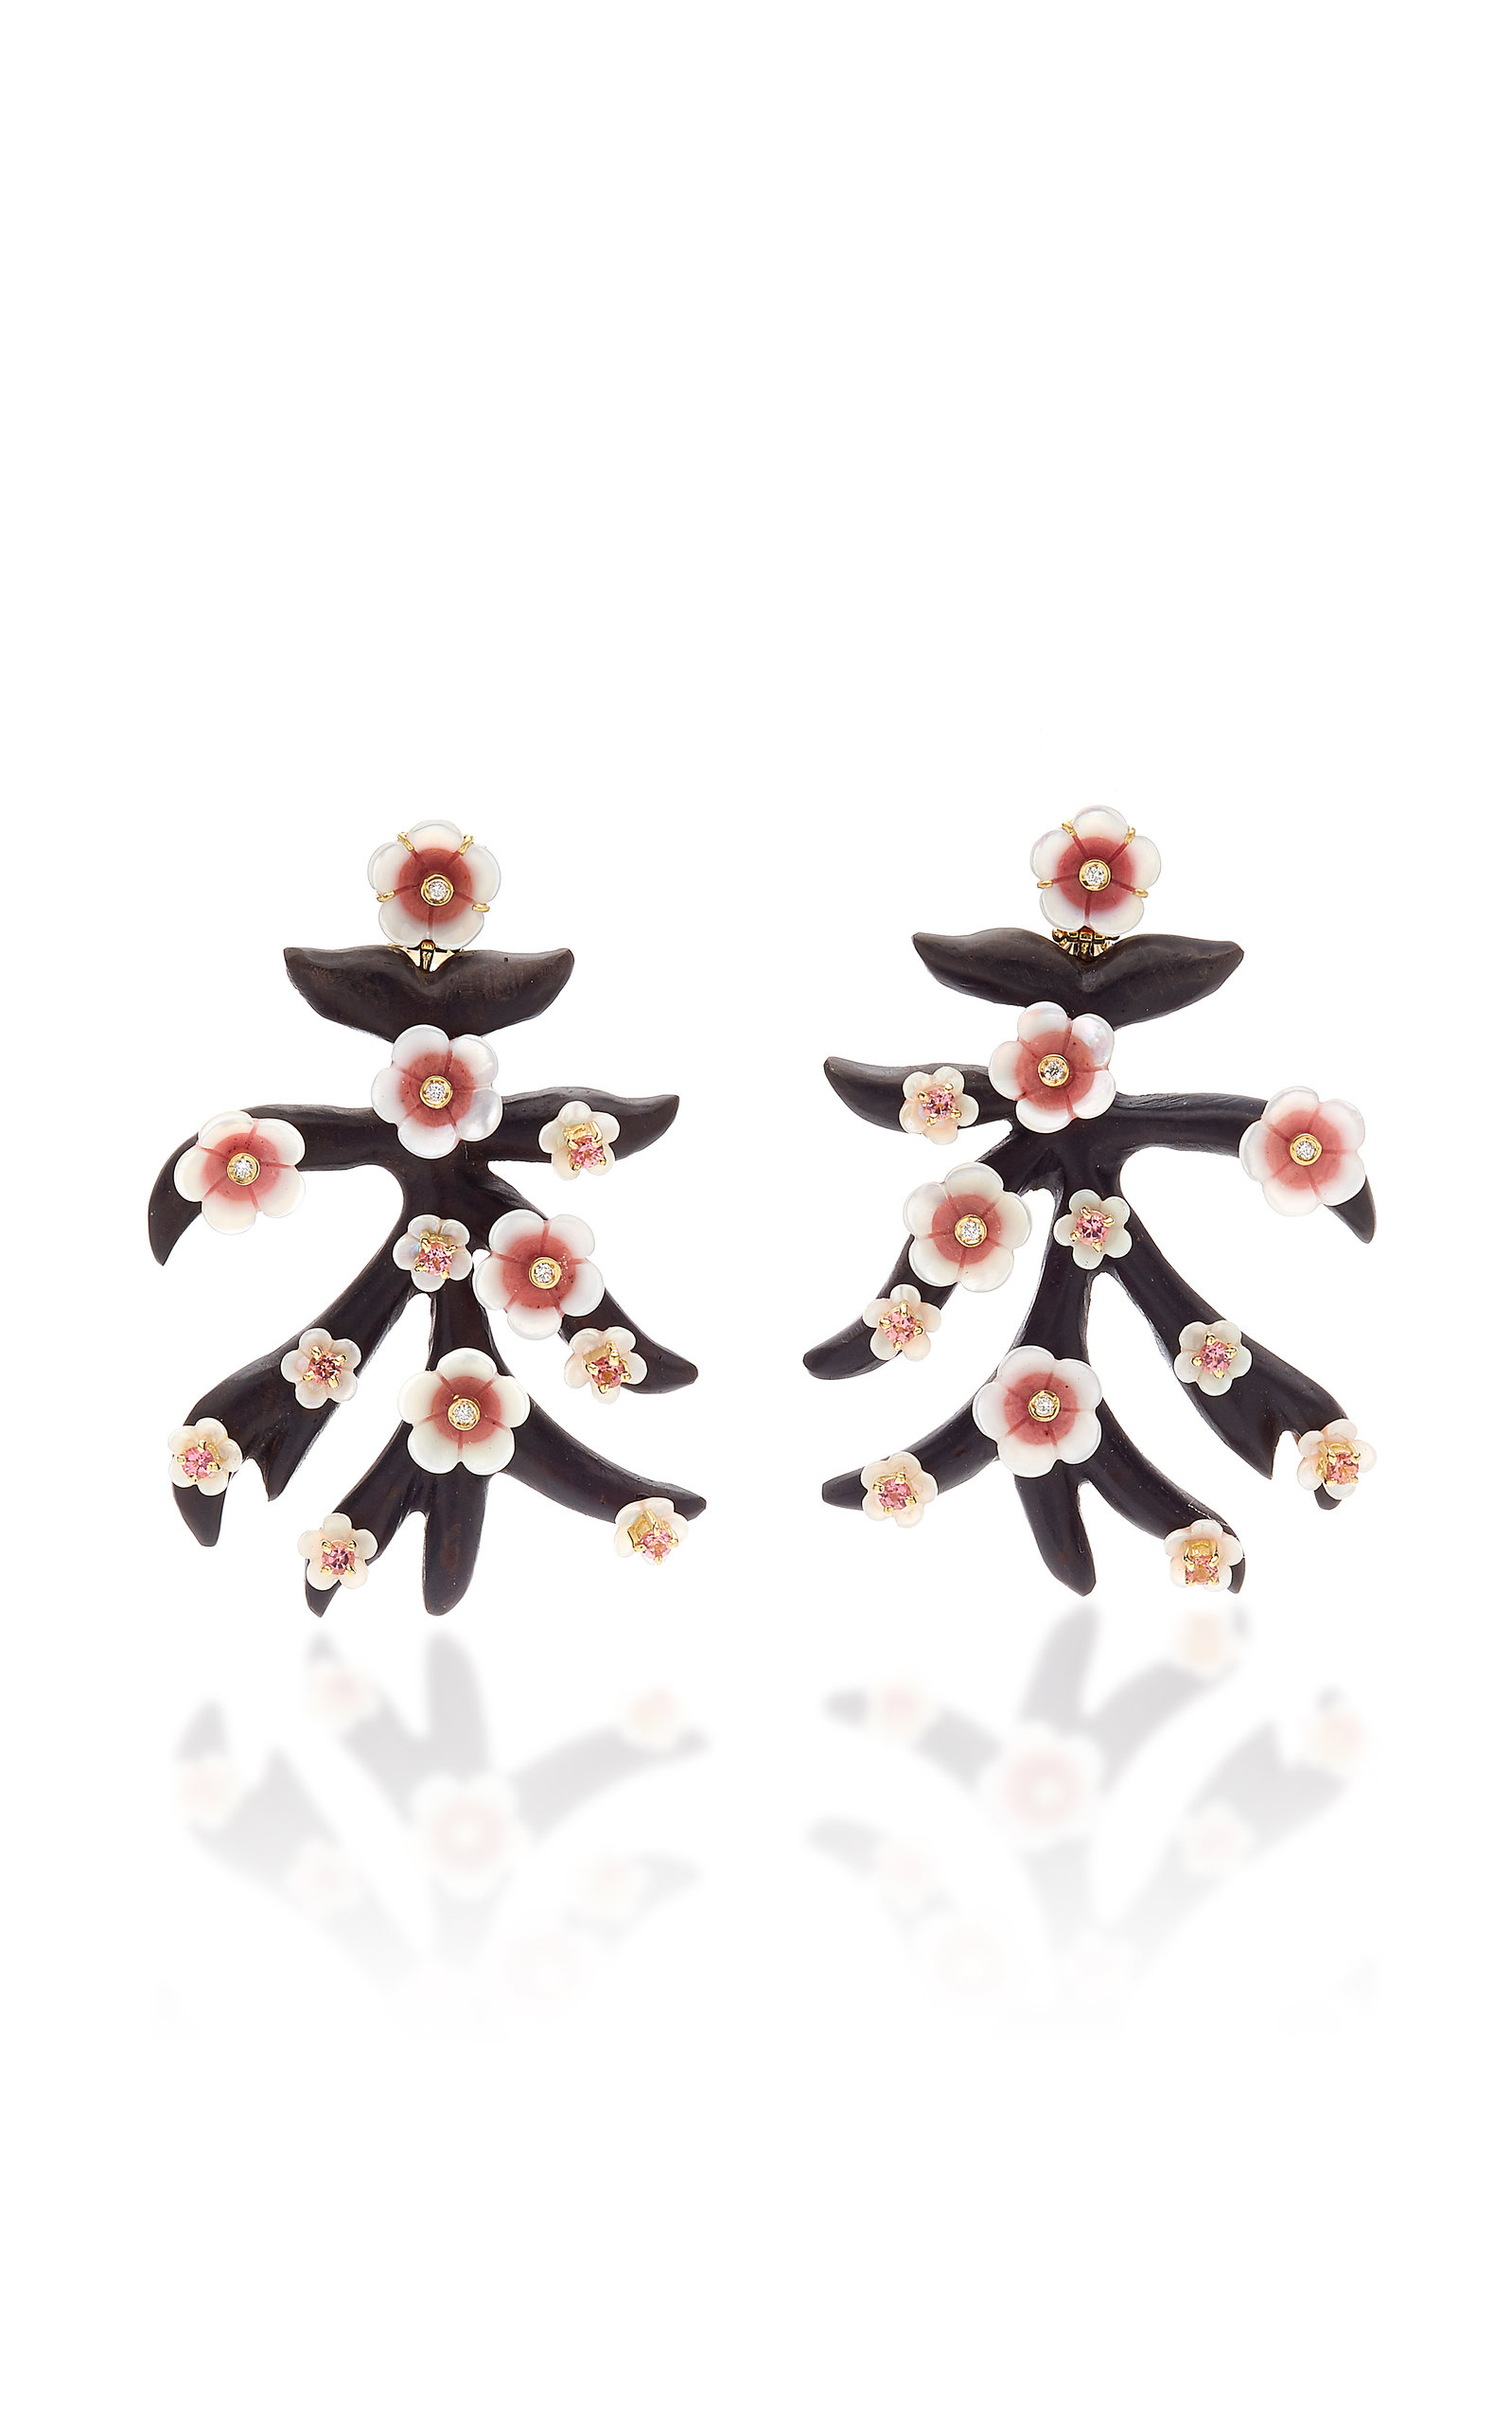 Casa Castro - Women's 18K Gold; Pink Quartzite and Ebony Branch Earrings - Gold - Moda Operandi